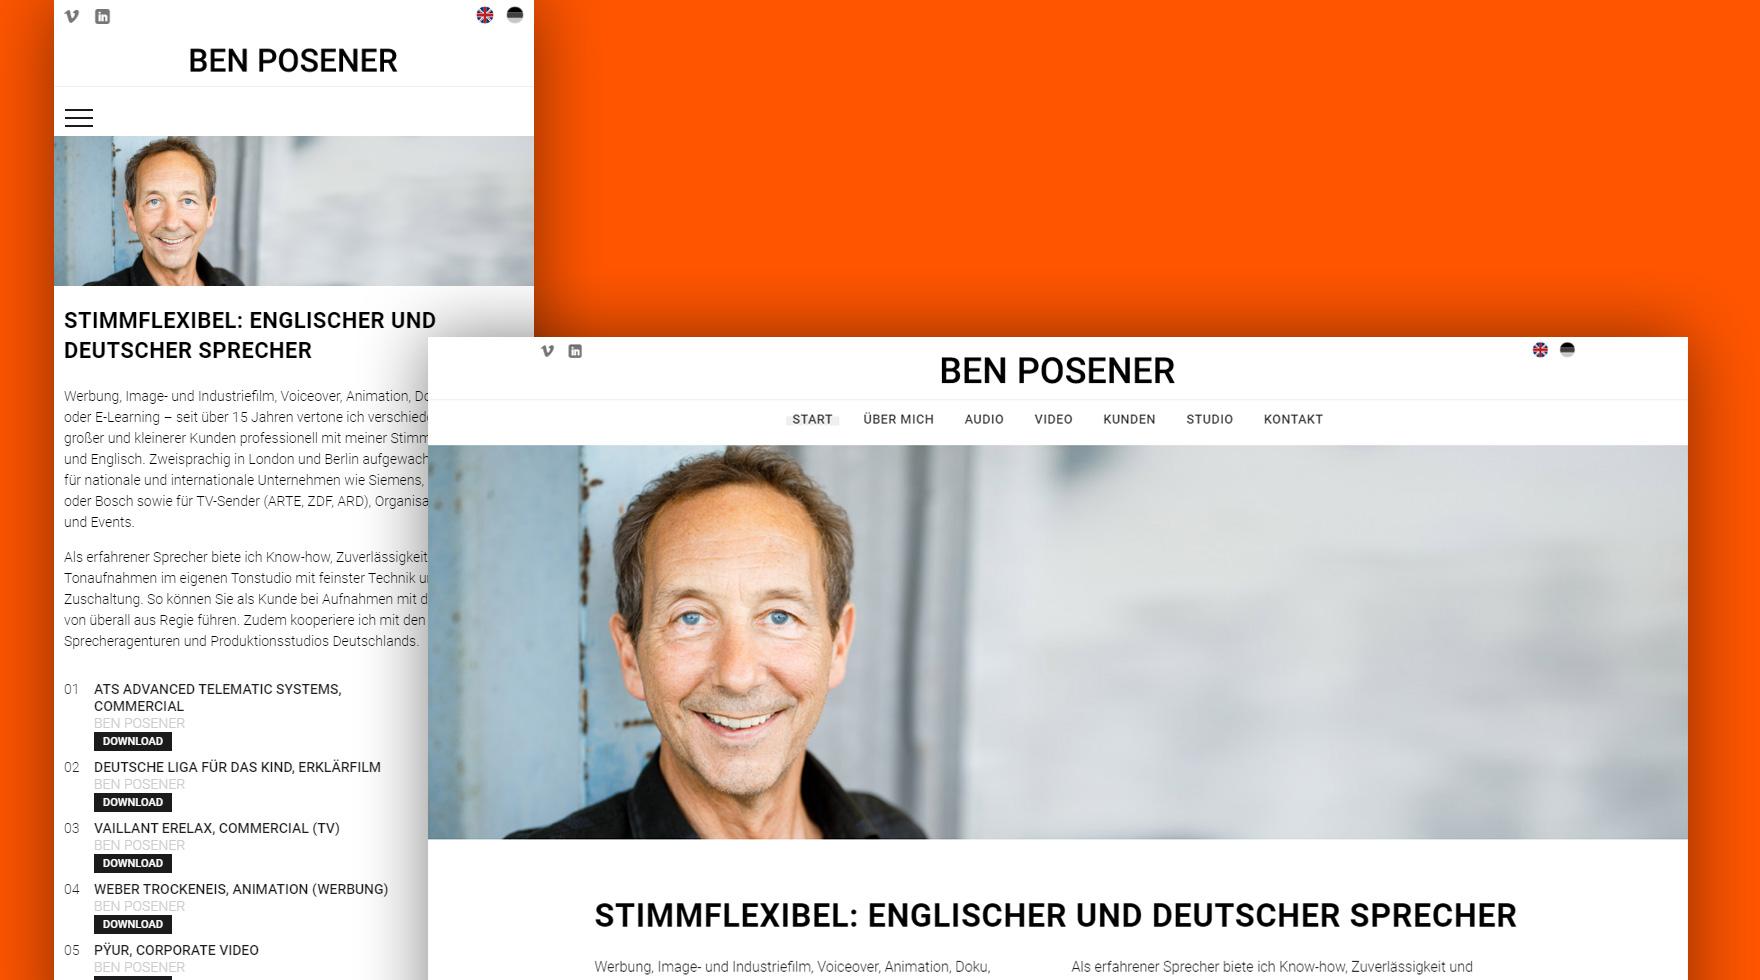 webdesigner-programmierer-berlin-fuer-ben-posener